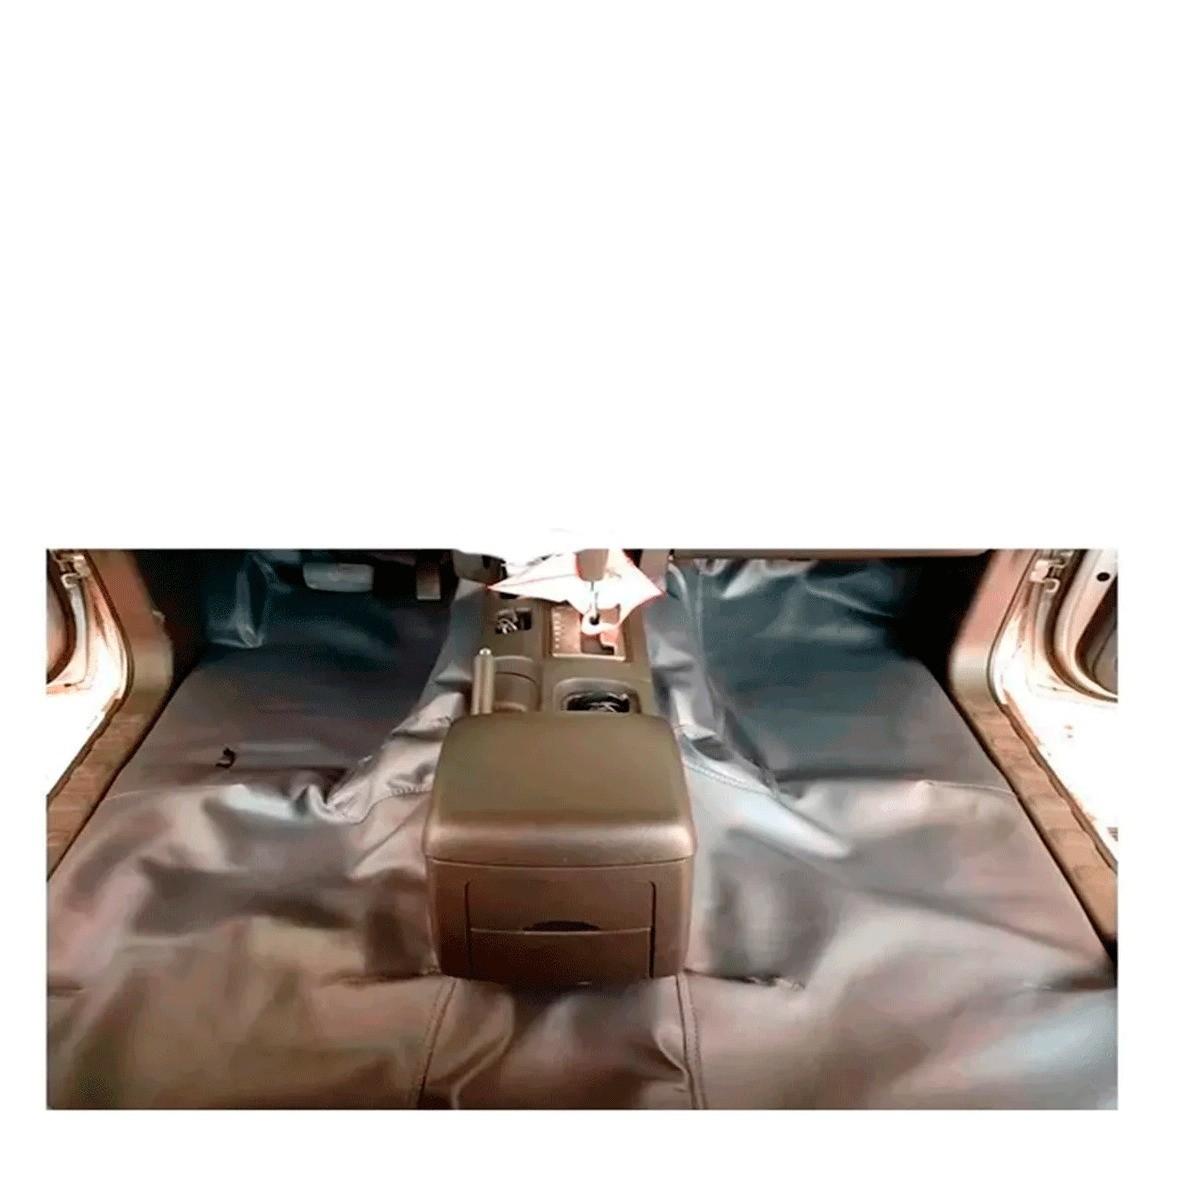 Tapete Automotivo Assoalho Emborrachado Bidim Ford Ká até 2000